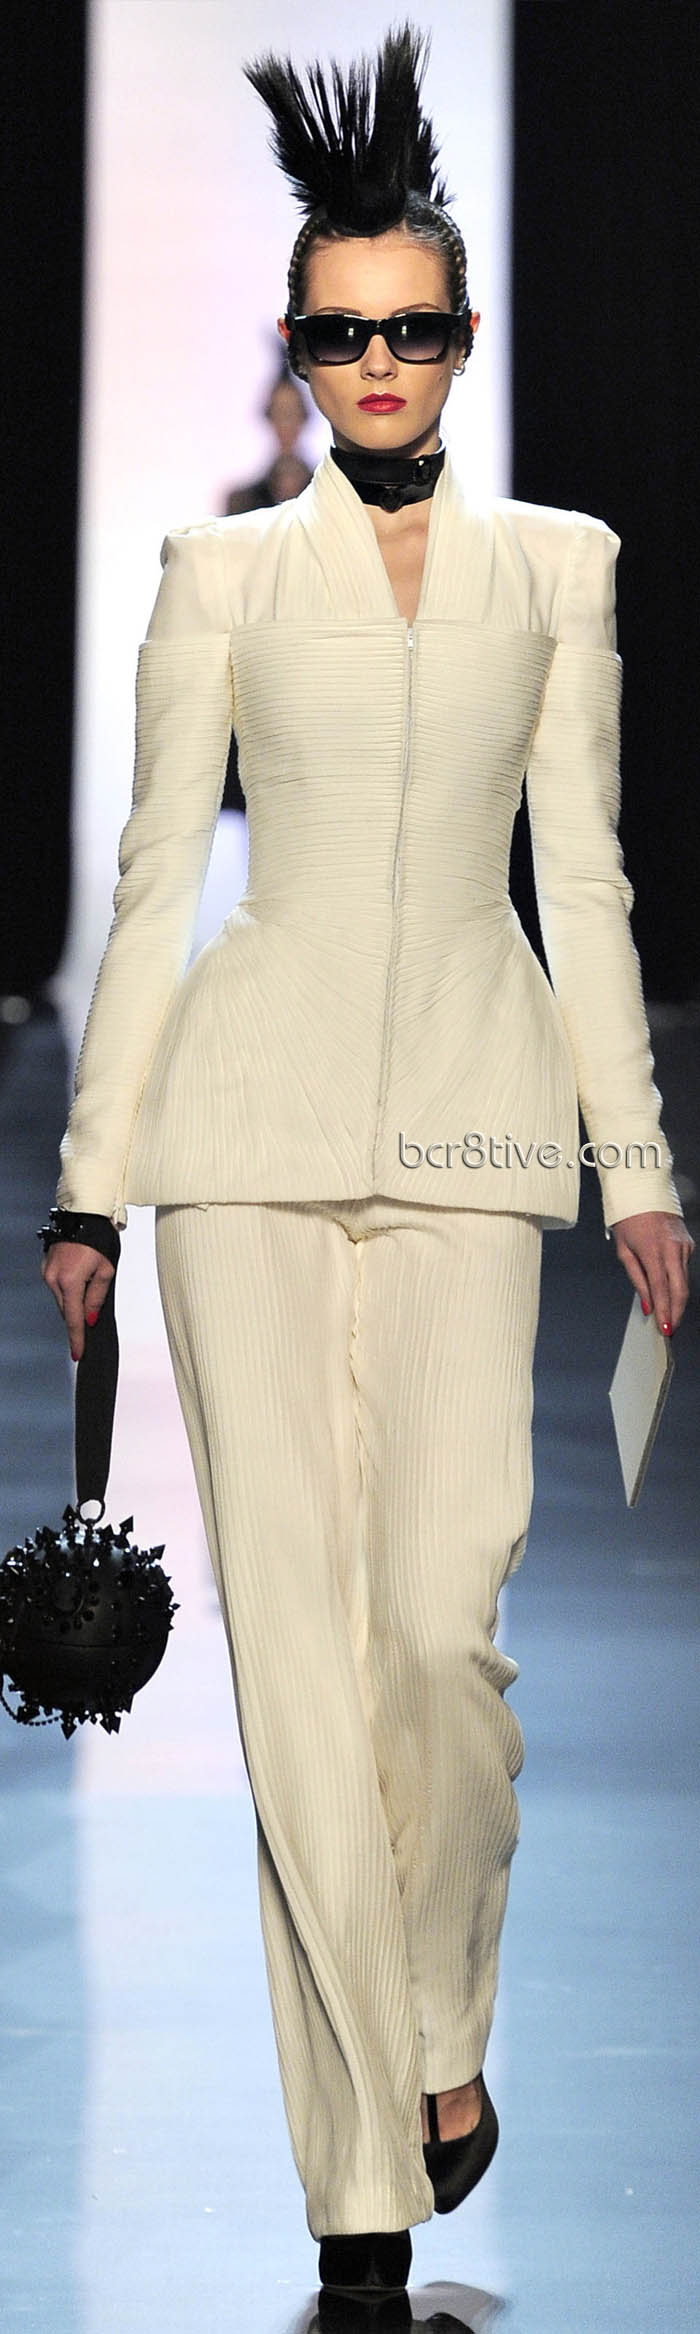 Jean Paul Gaultier HC Spring 2011